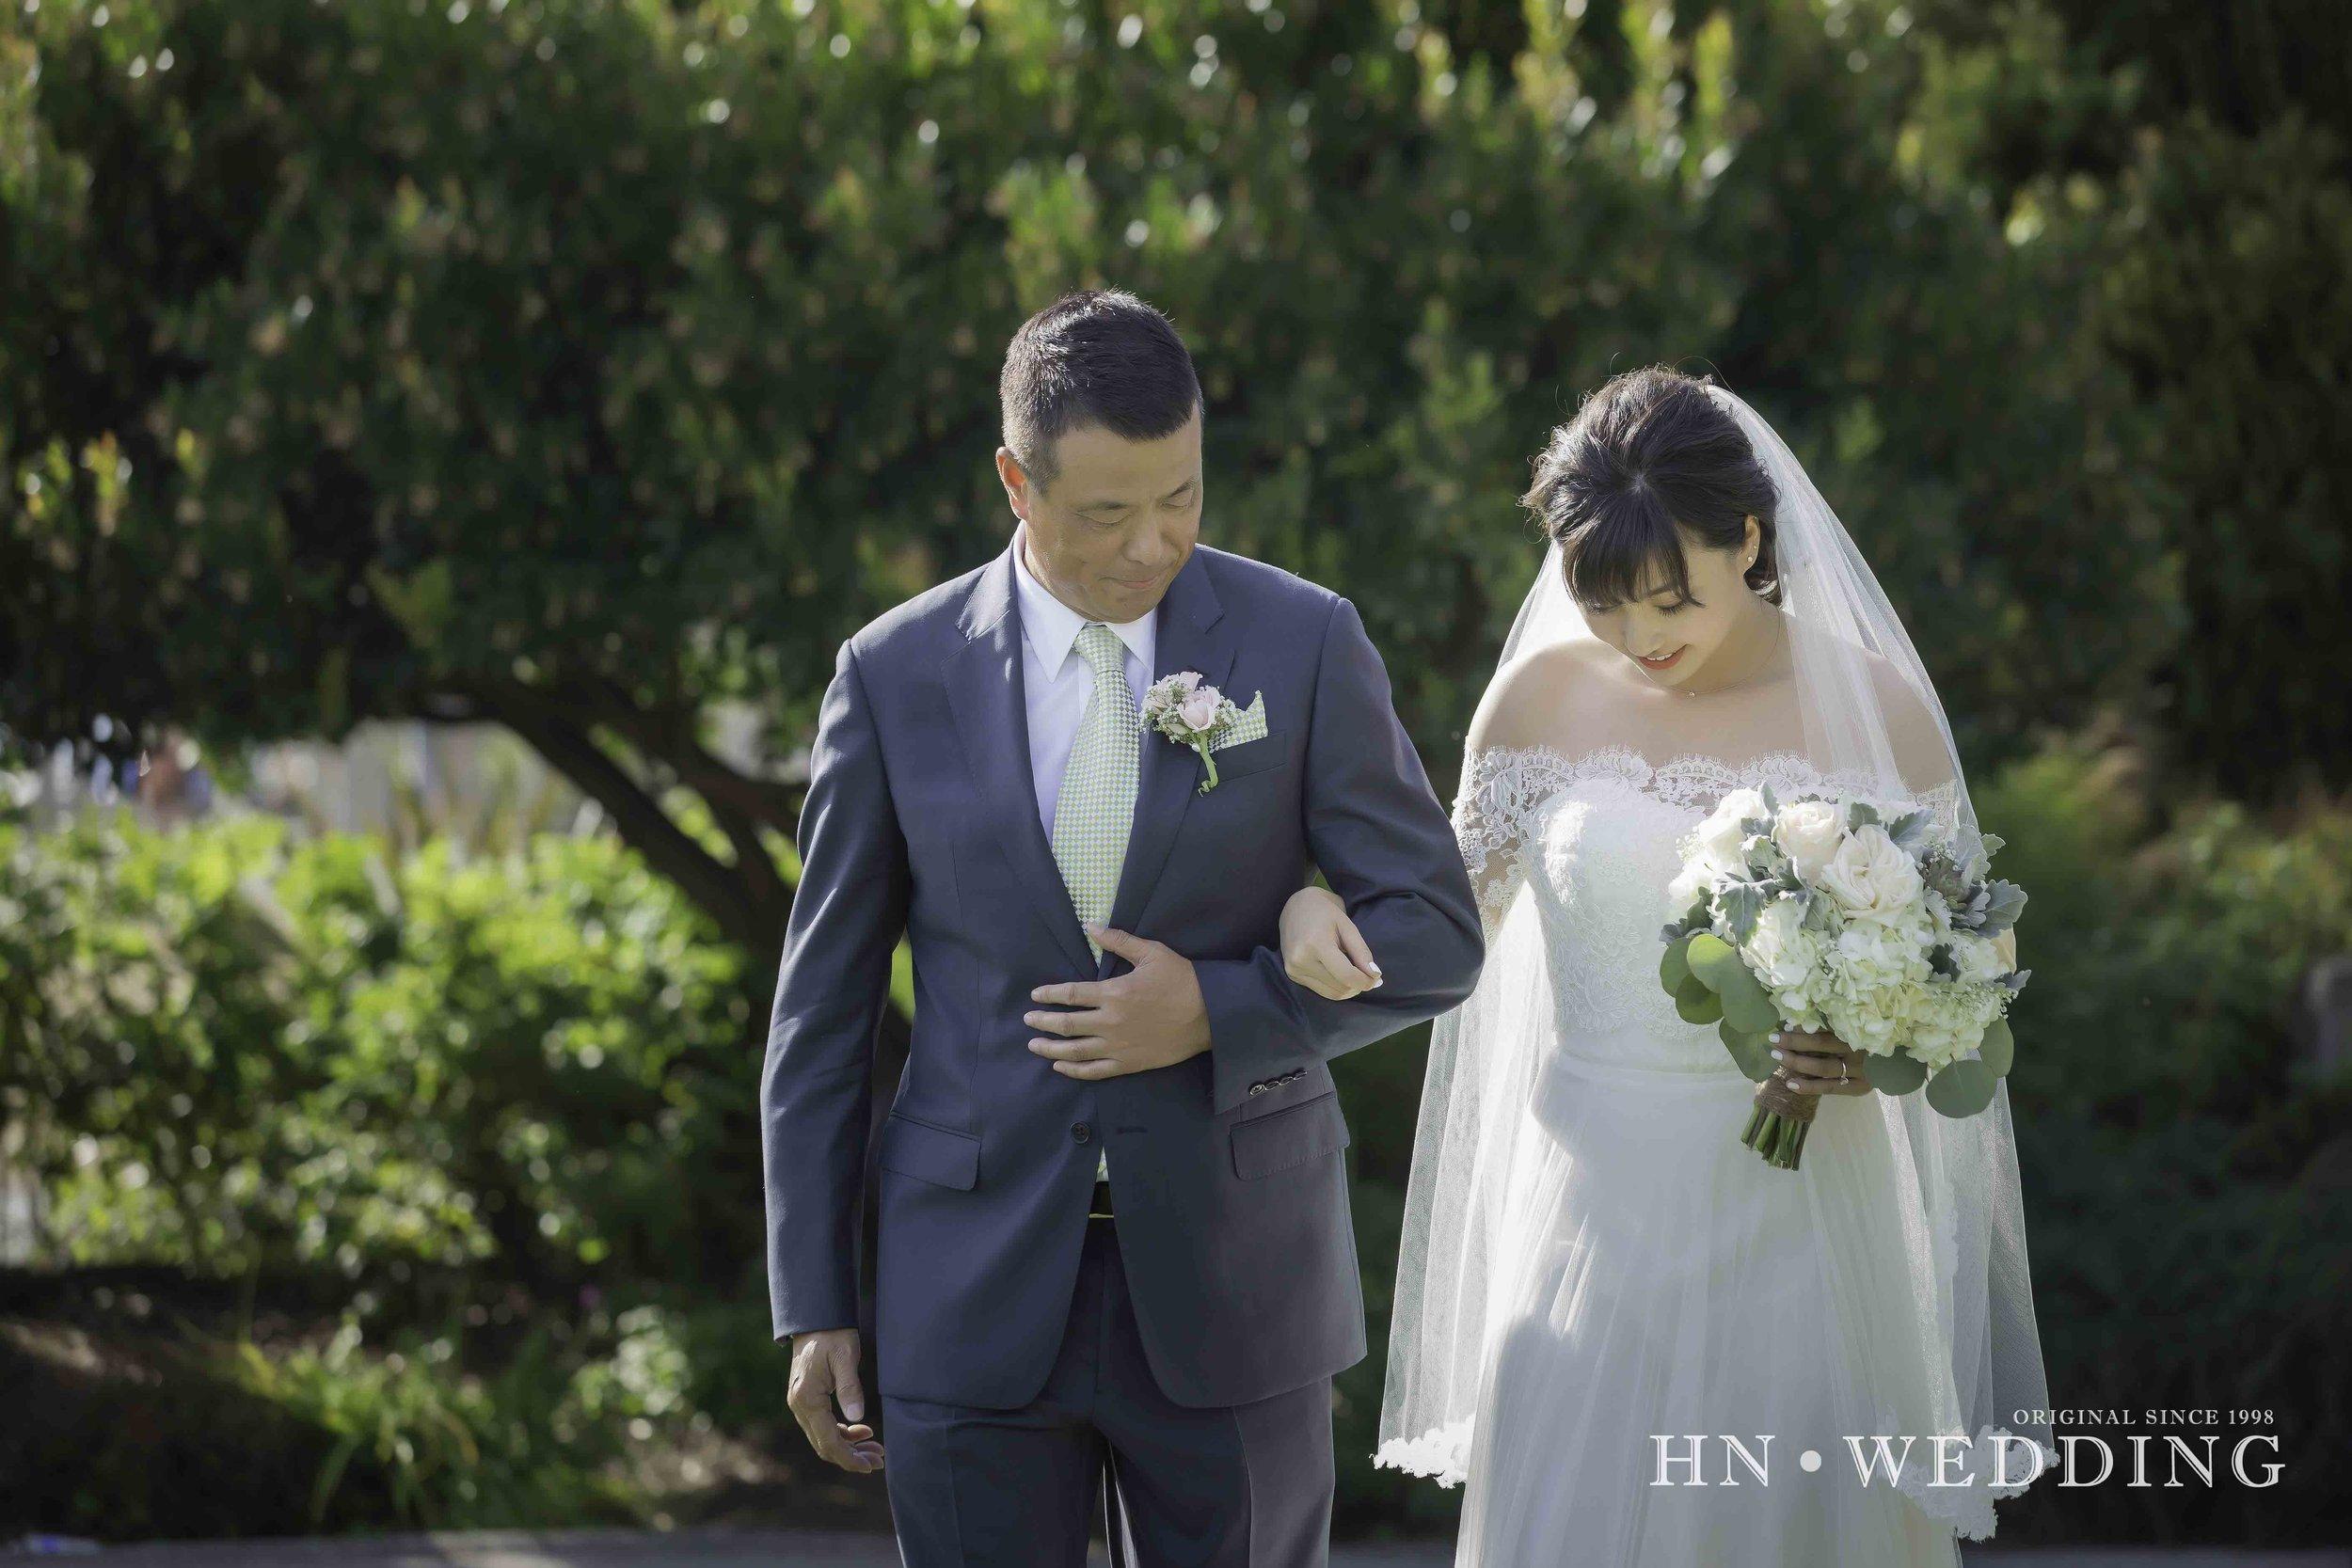 HNwedding-20160826-wedding-1828.jpg